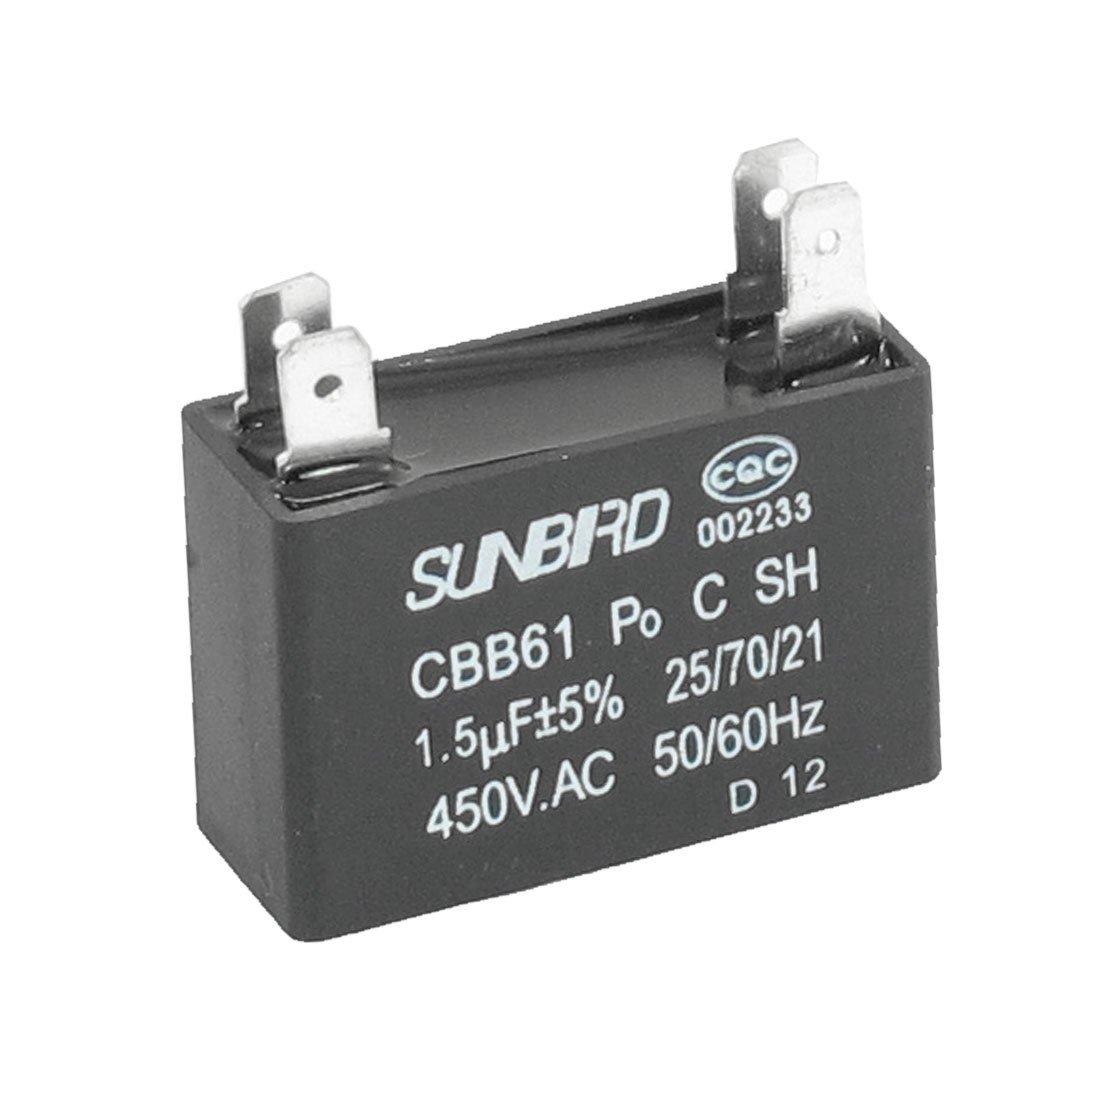 OSG USA 48172336 3.36mm WX-MS-GDS Micro Drill Inc.